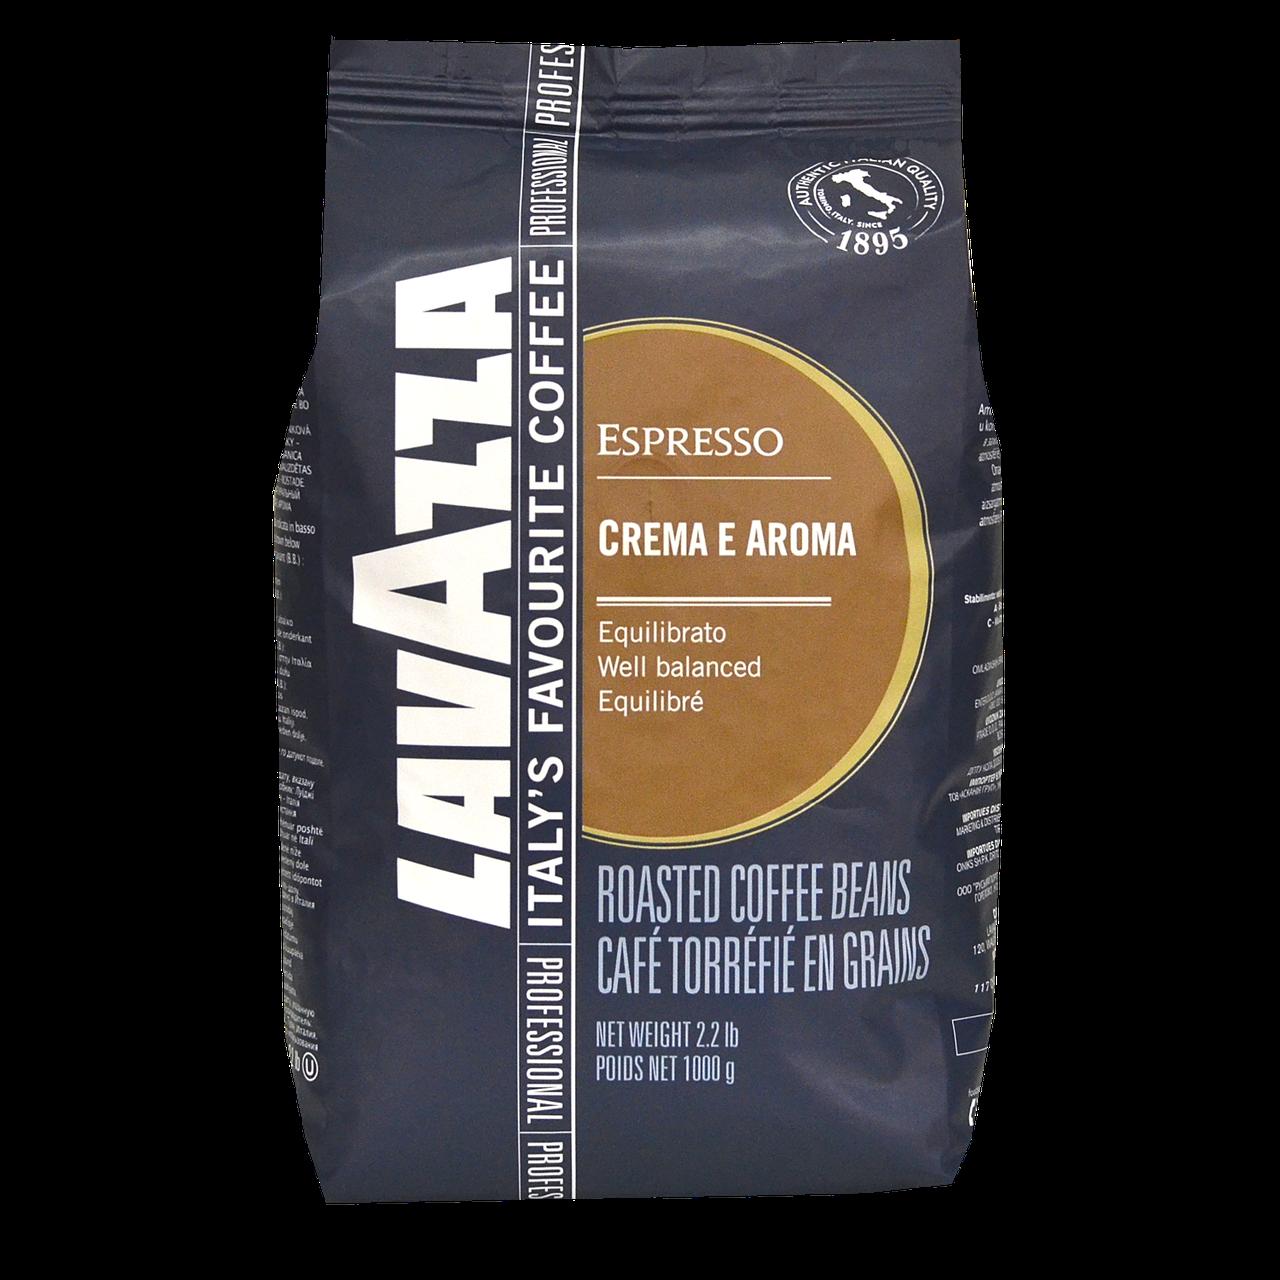 Кава в зернах Lavazza Crema e Aroma Espreso 1kg 80/20 Original